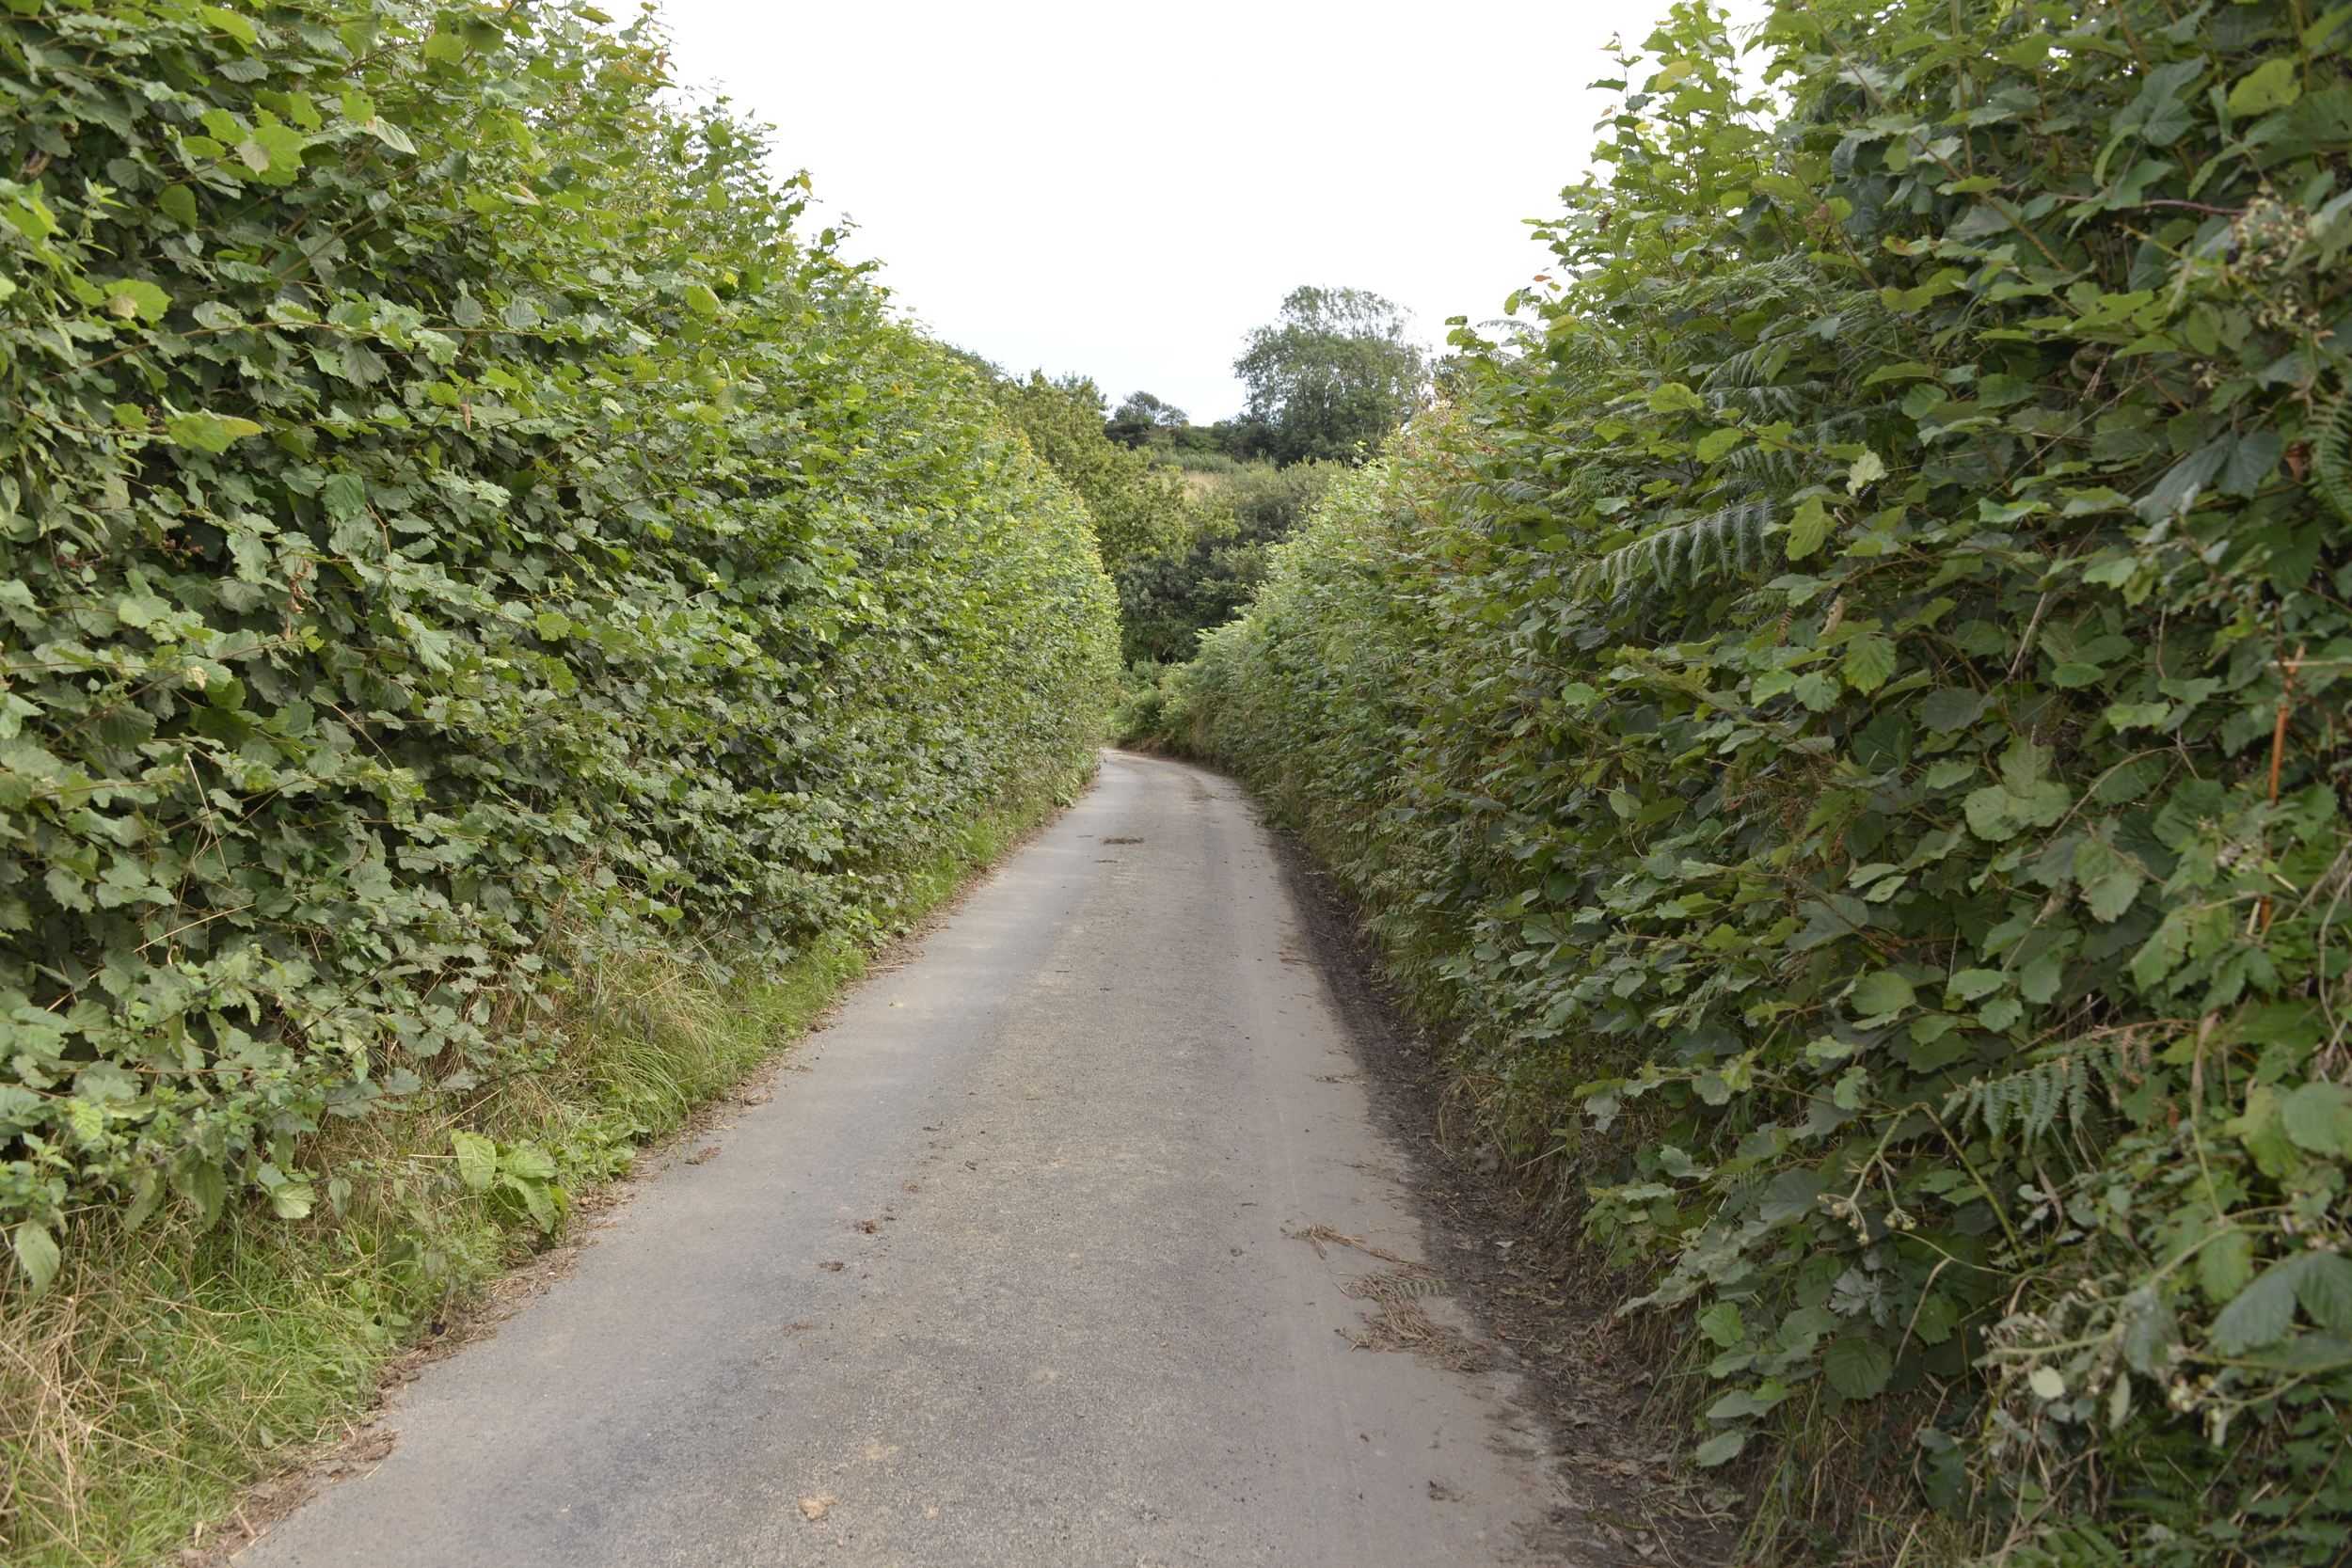 A narrow road in Cornwall